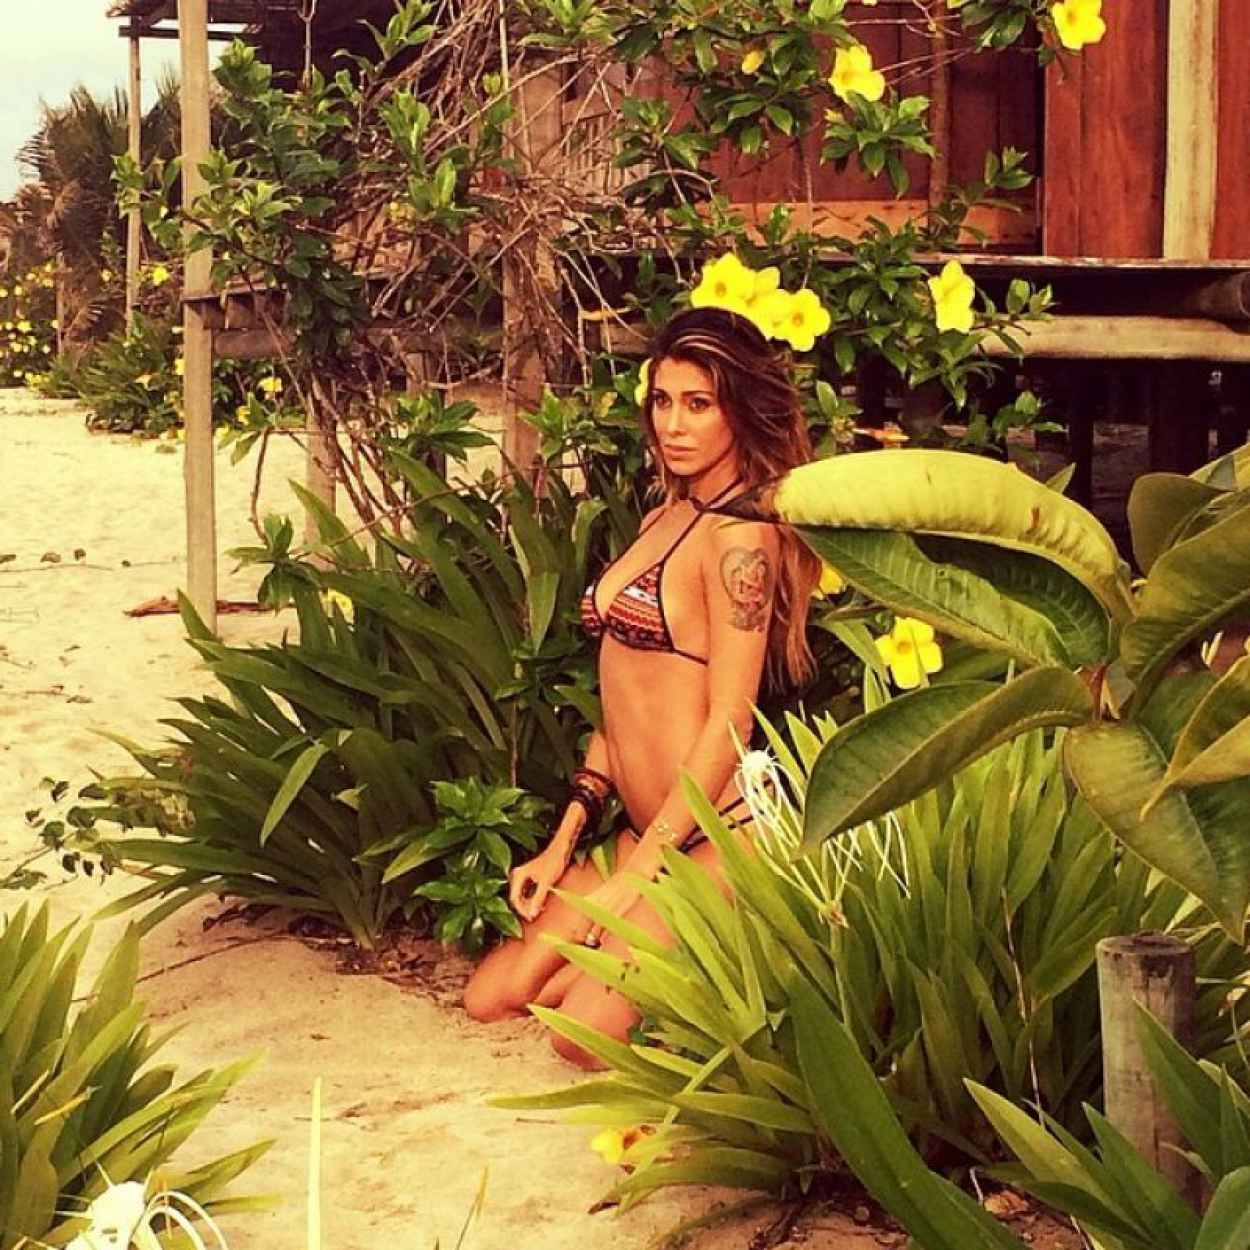 Belen Rodriguez in Bikini - Photoshoot for SportWeek Dreams 2015-1